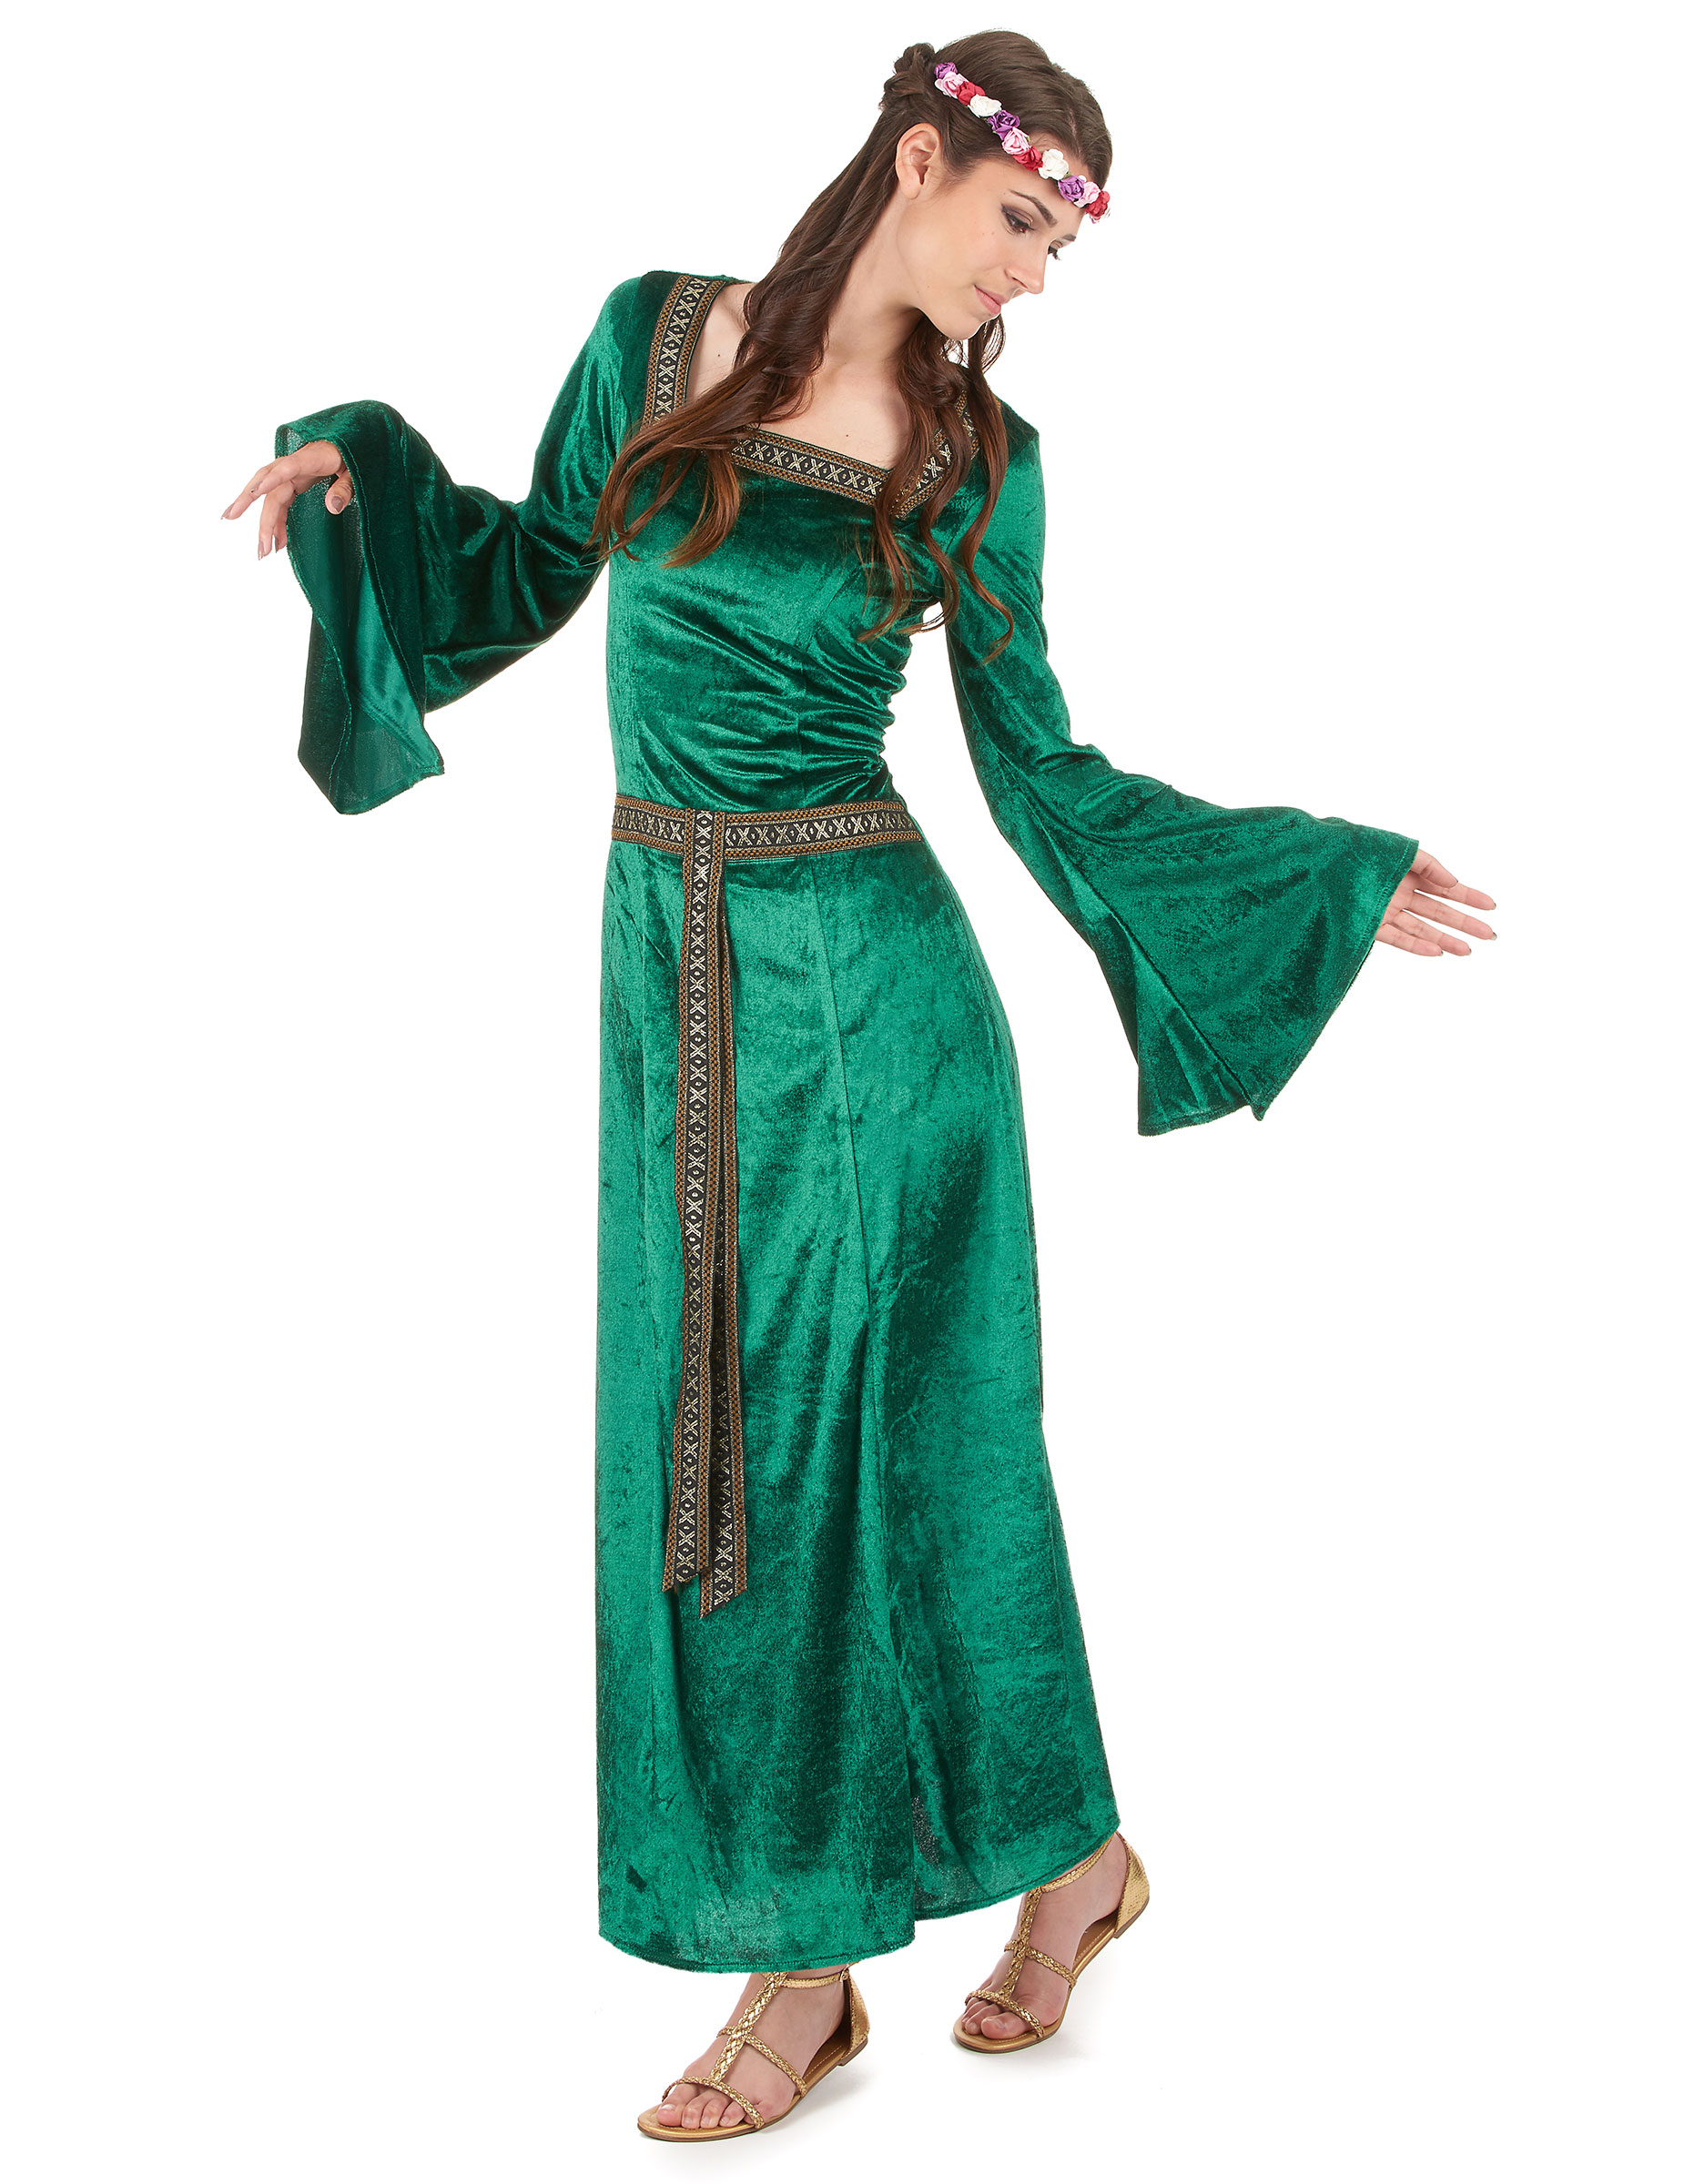 bf09d3a01ff Déguisement médiéval vert effet velours femme   Deguise-toi